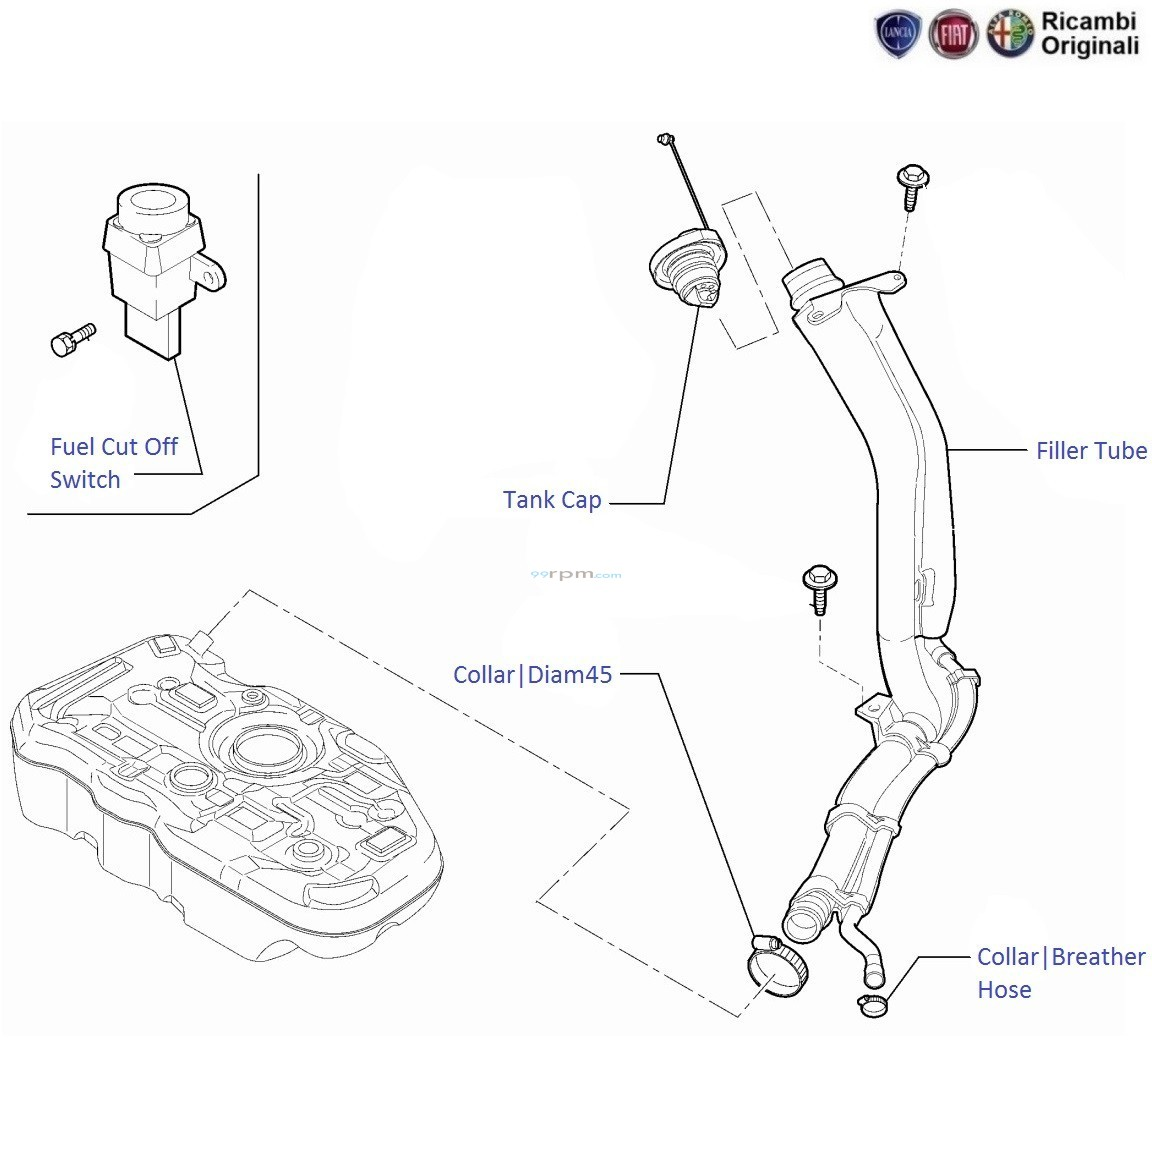 FIAT Linea 1 3 MJD Diesel: Fuel Filler Tube